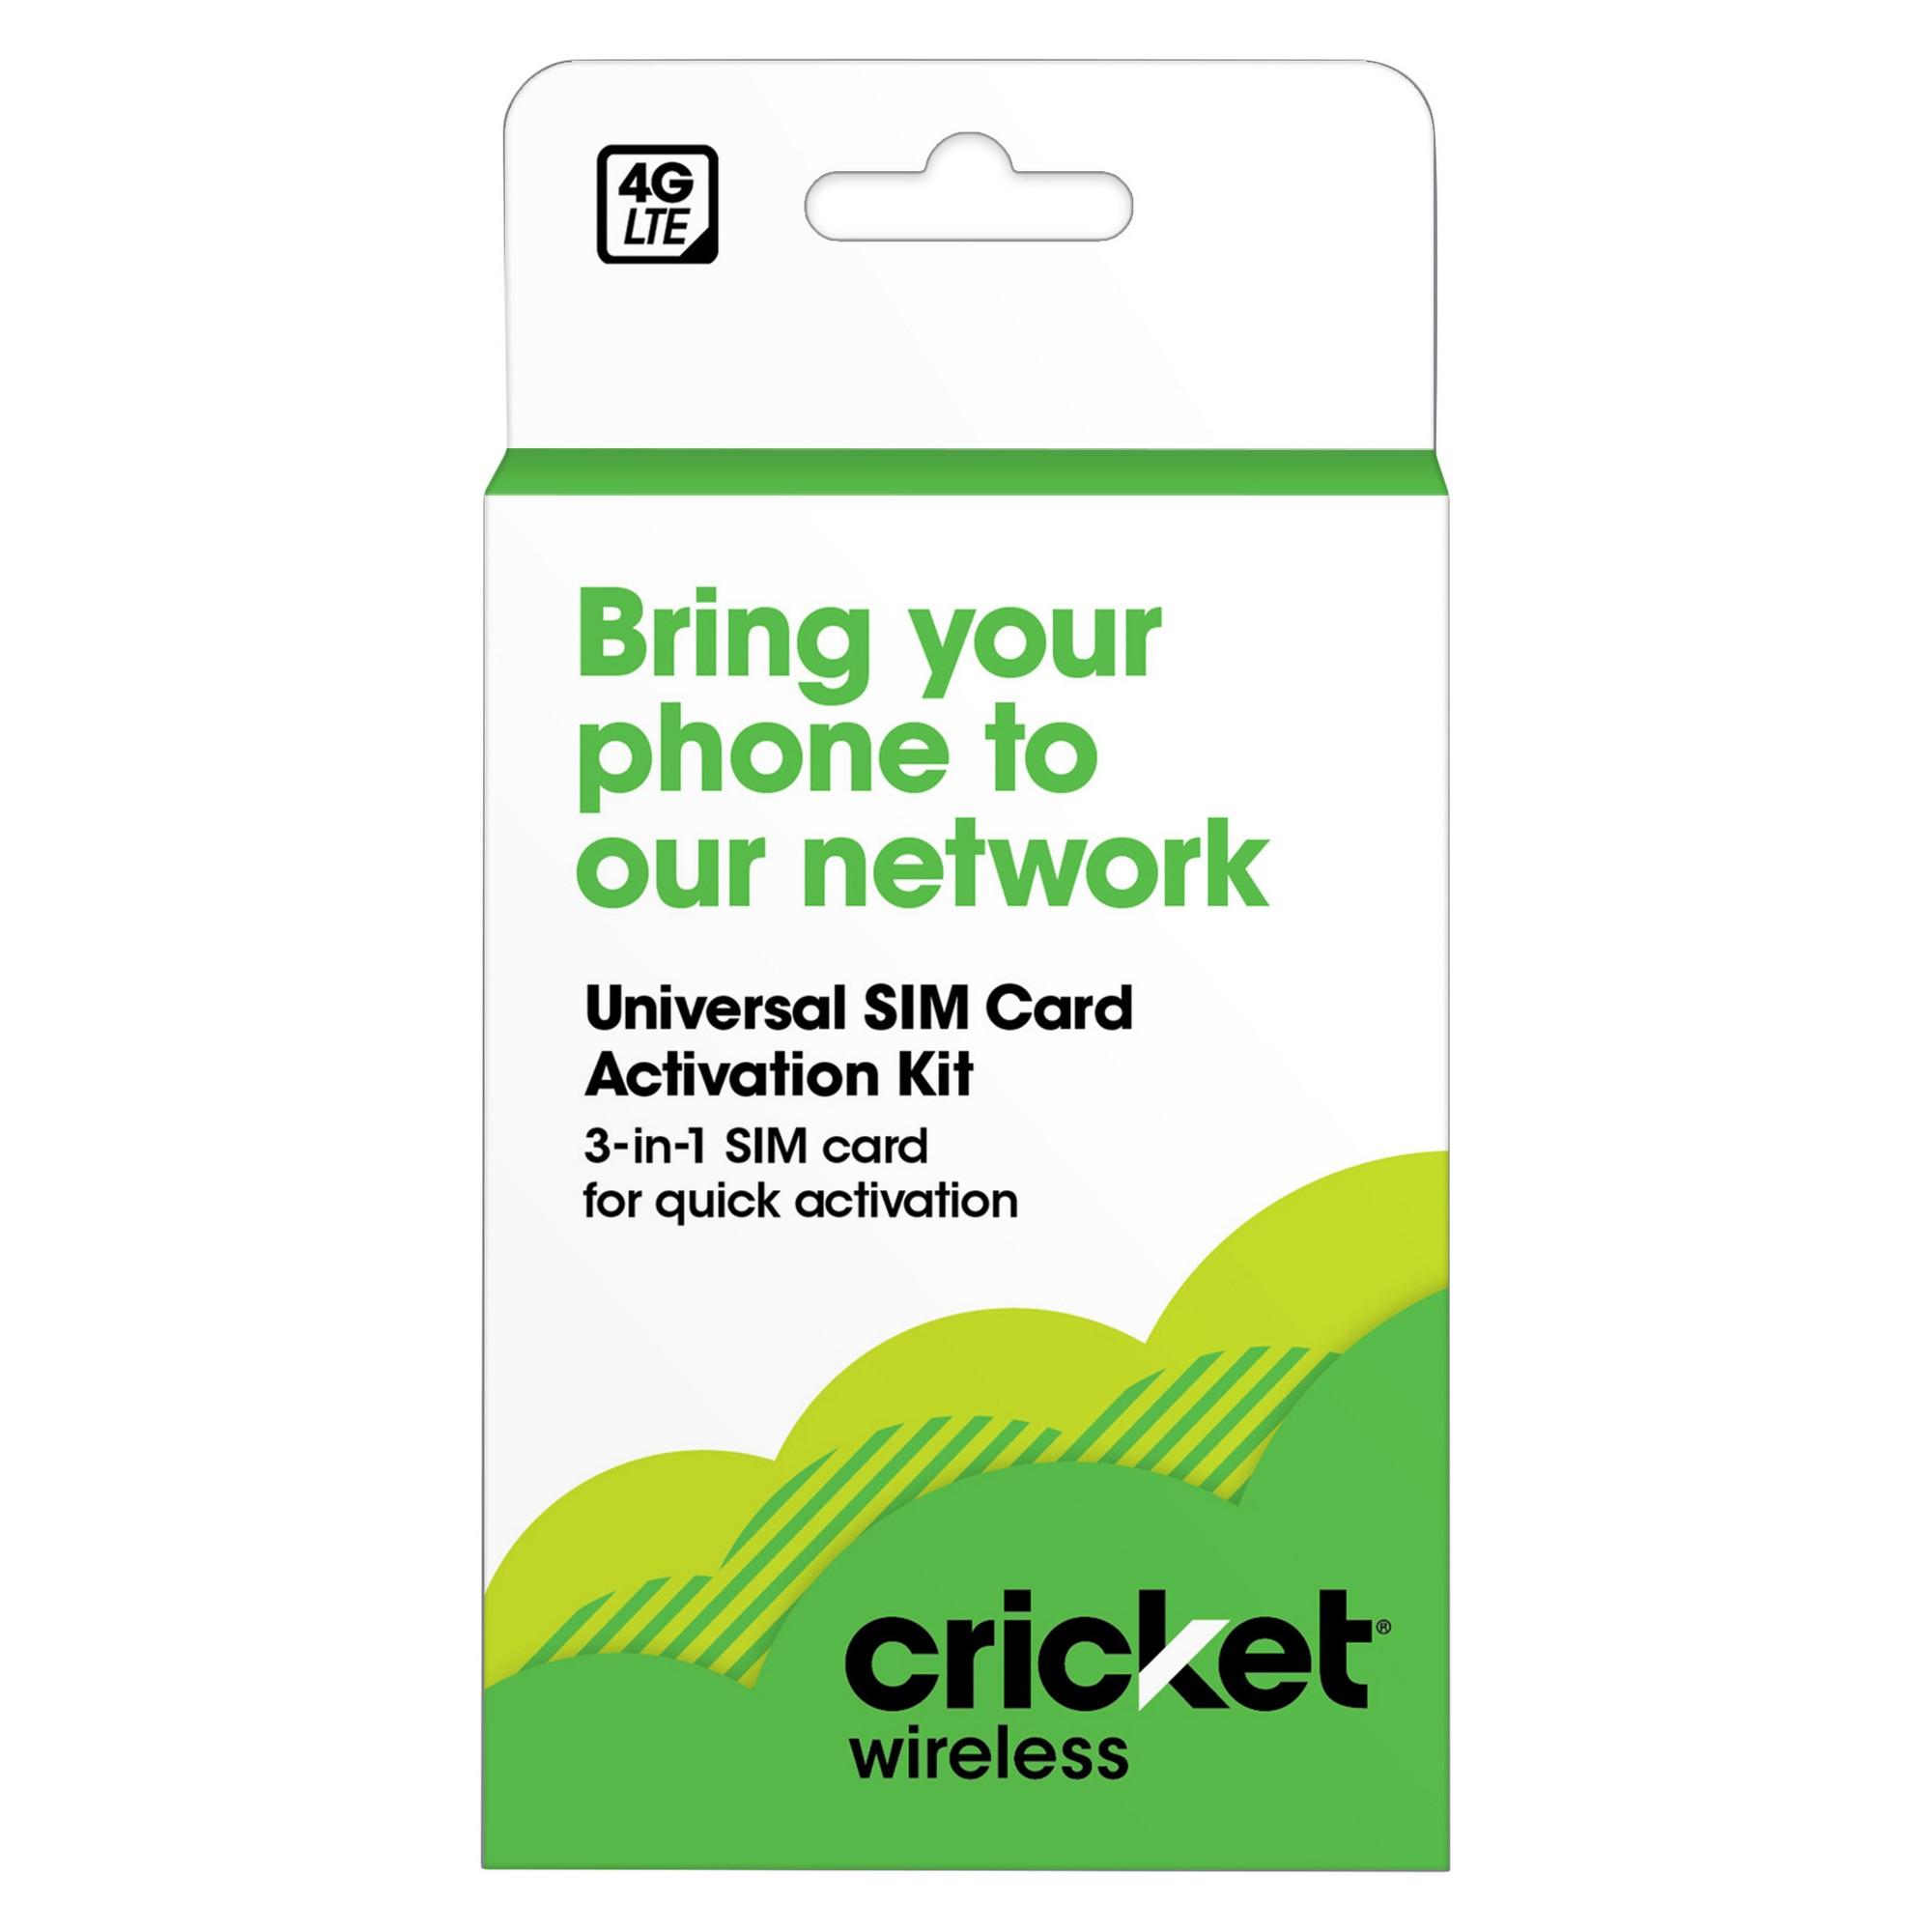 Cricket Byod Sim Kit Sim Cards Sims Cricket Wireless Buy Phones